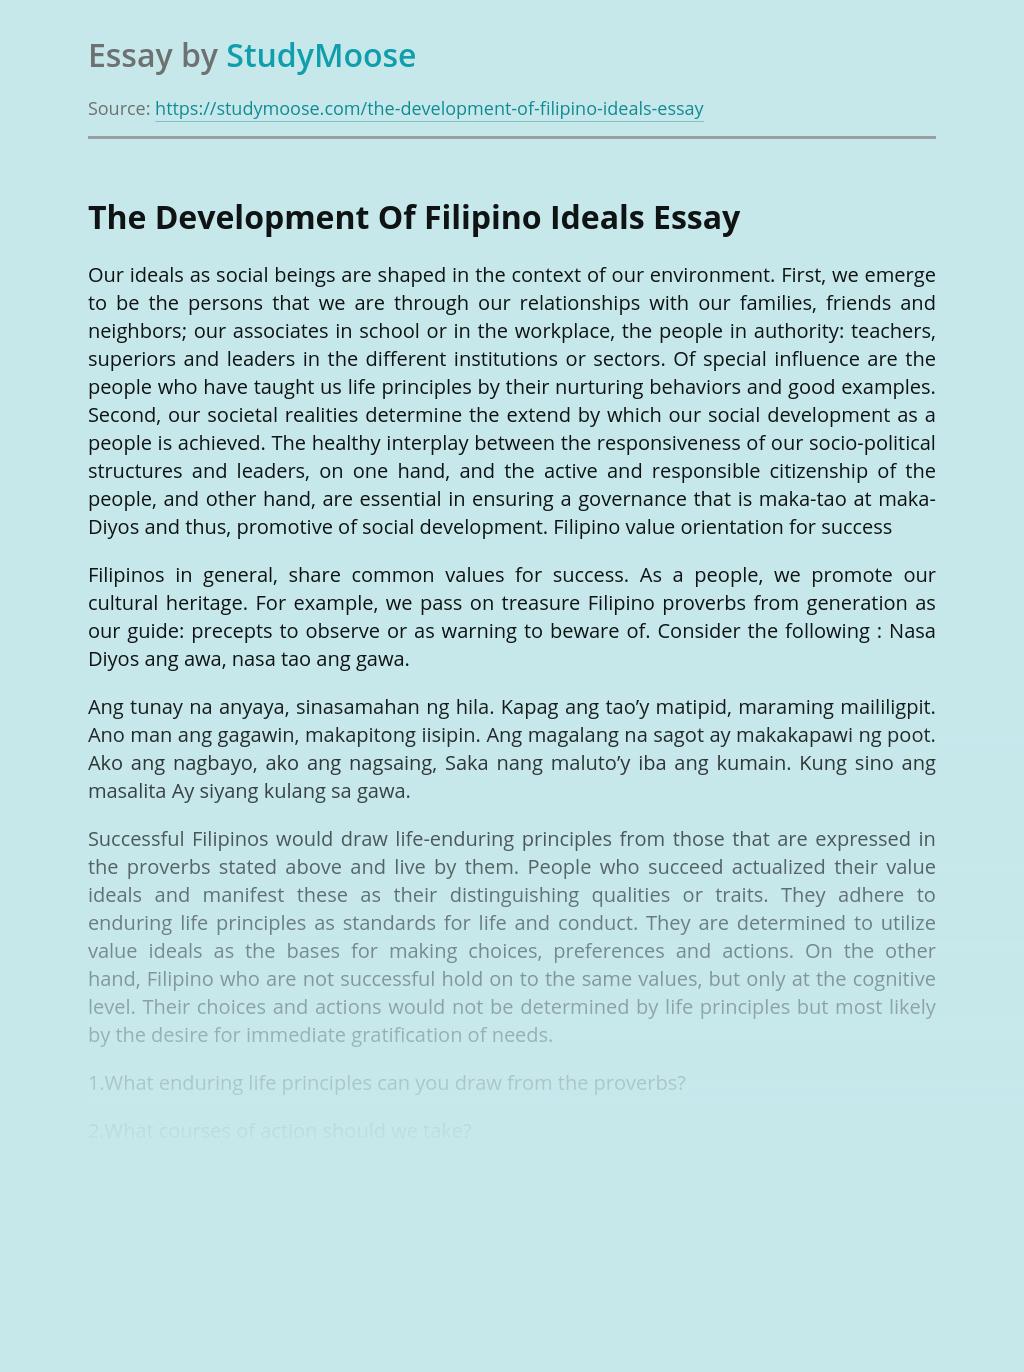 The Development Of Filipino Ideals